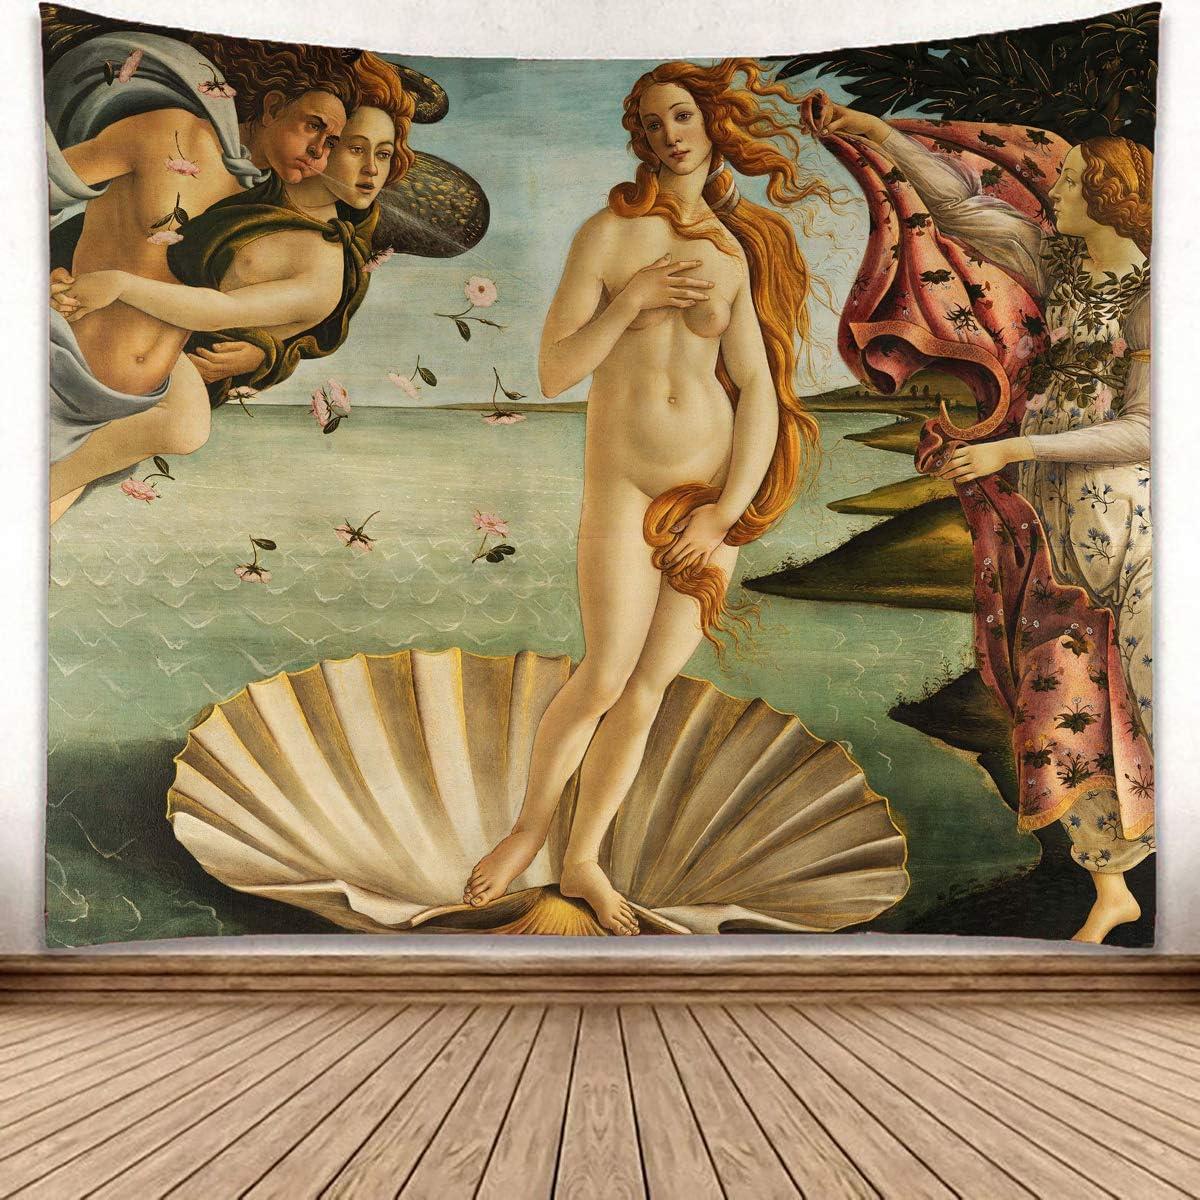 LedBack Birth of Venus Masters of Italian Art Tapestry Wall Hanging Art Decor Renaissance Awakening of Venus and Angels Wall Tapestry Artwork Wall Decor for Living Room Bedroom